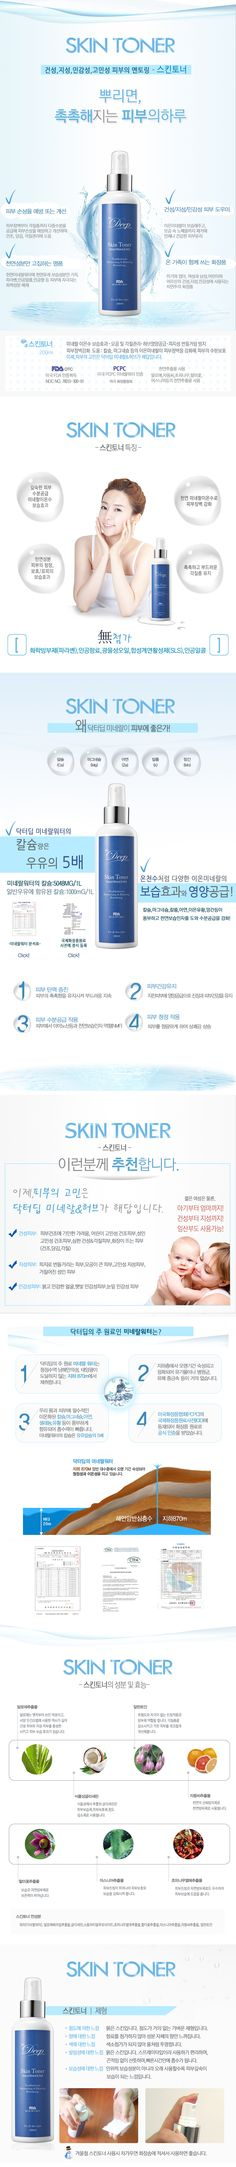 Skin Toner(Product page Design)